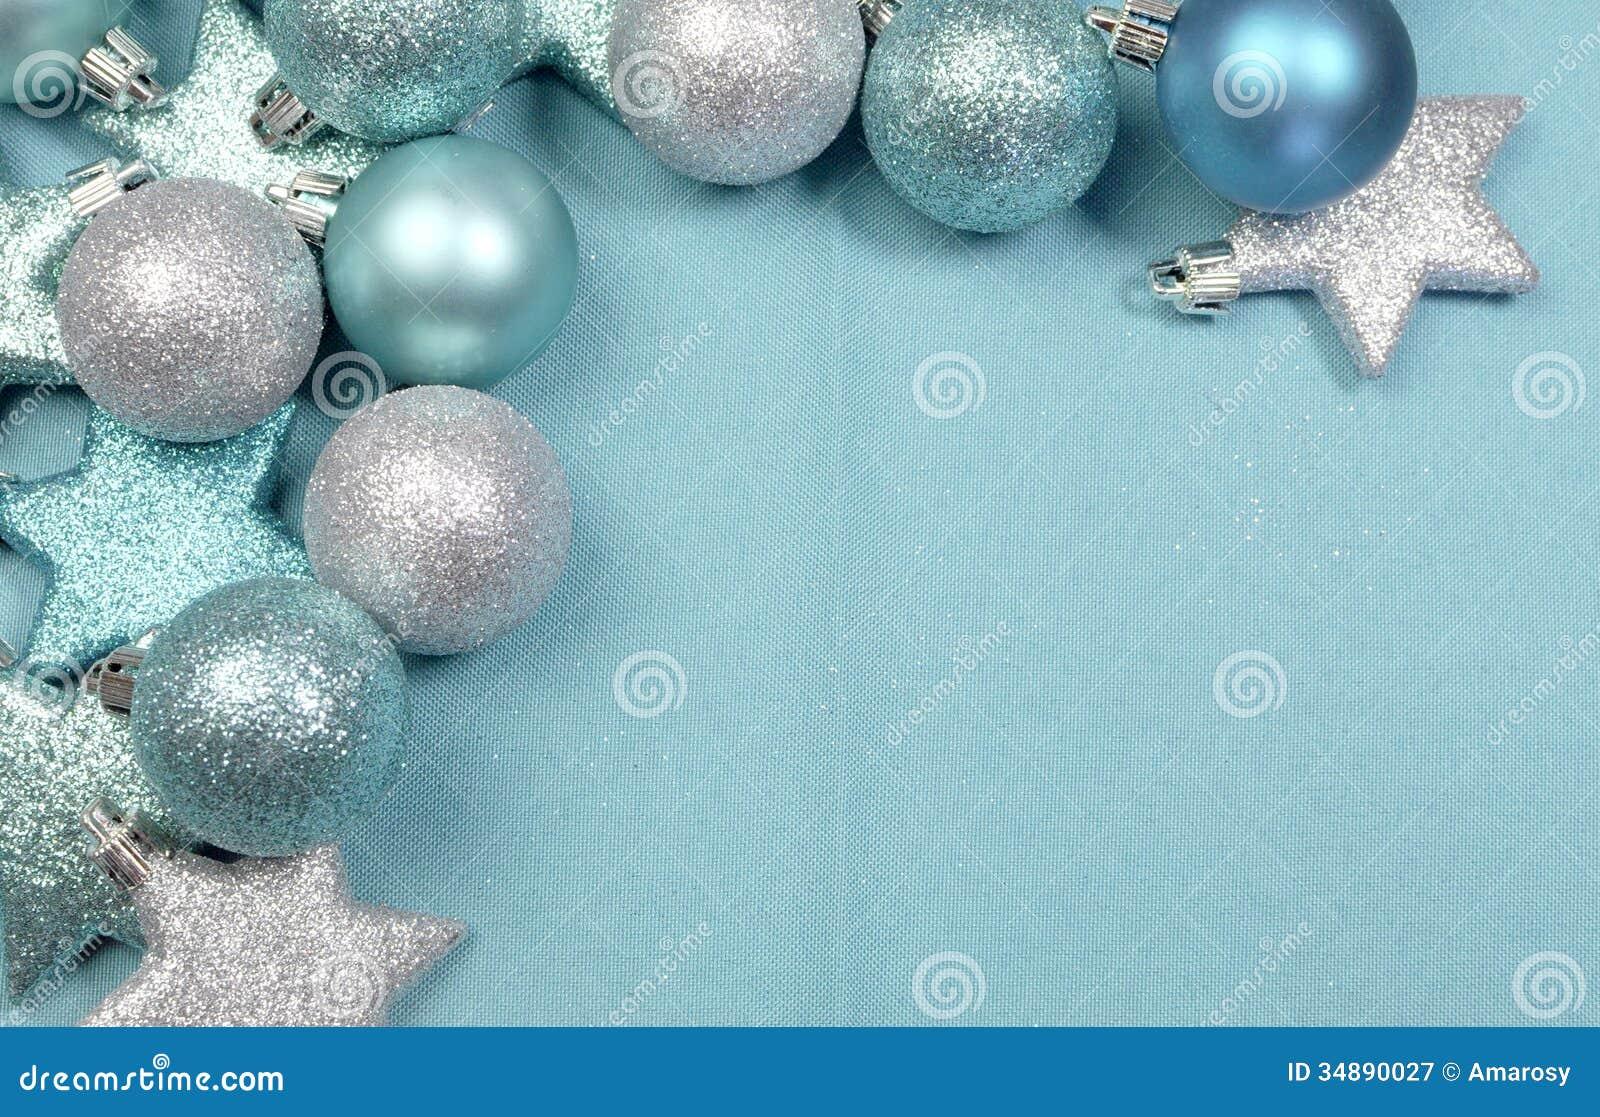 Festive Background Of Aqua Pale Blue Christmas Glitter